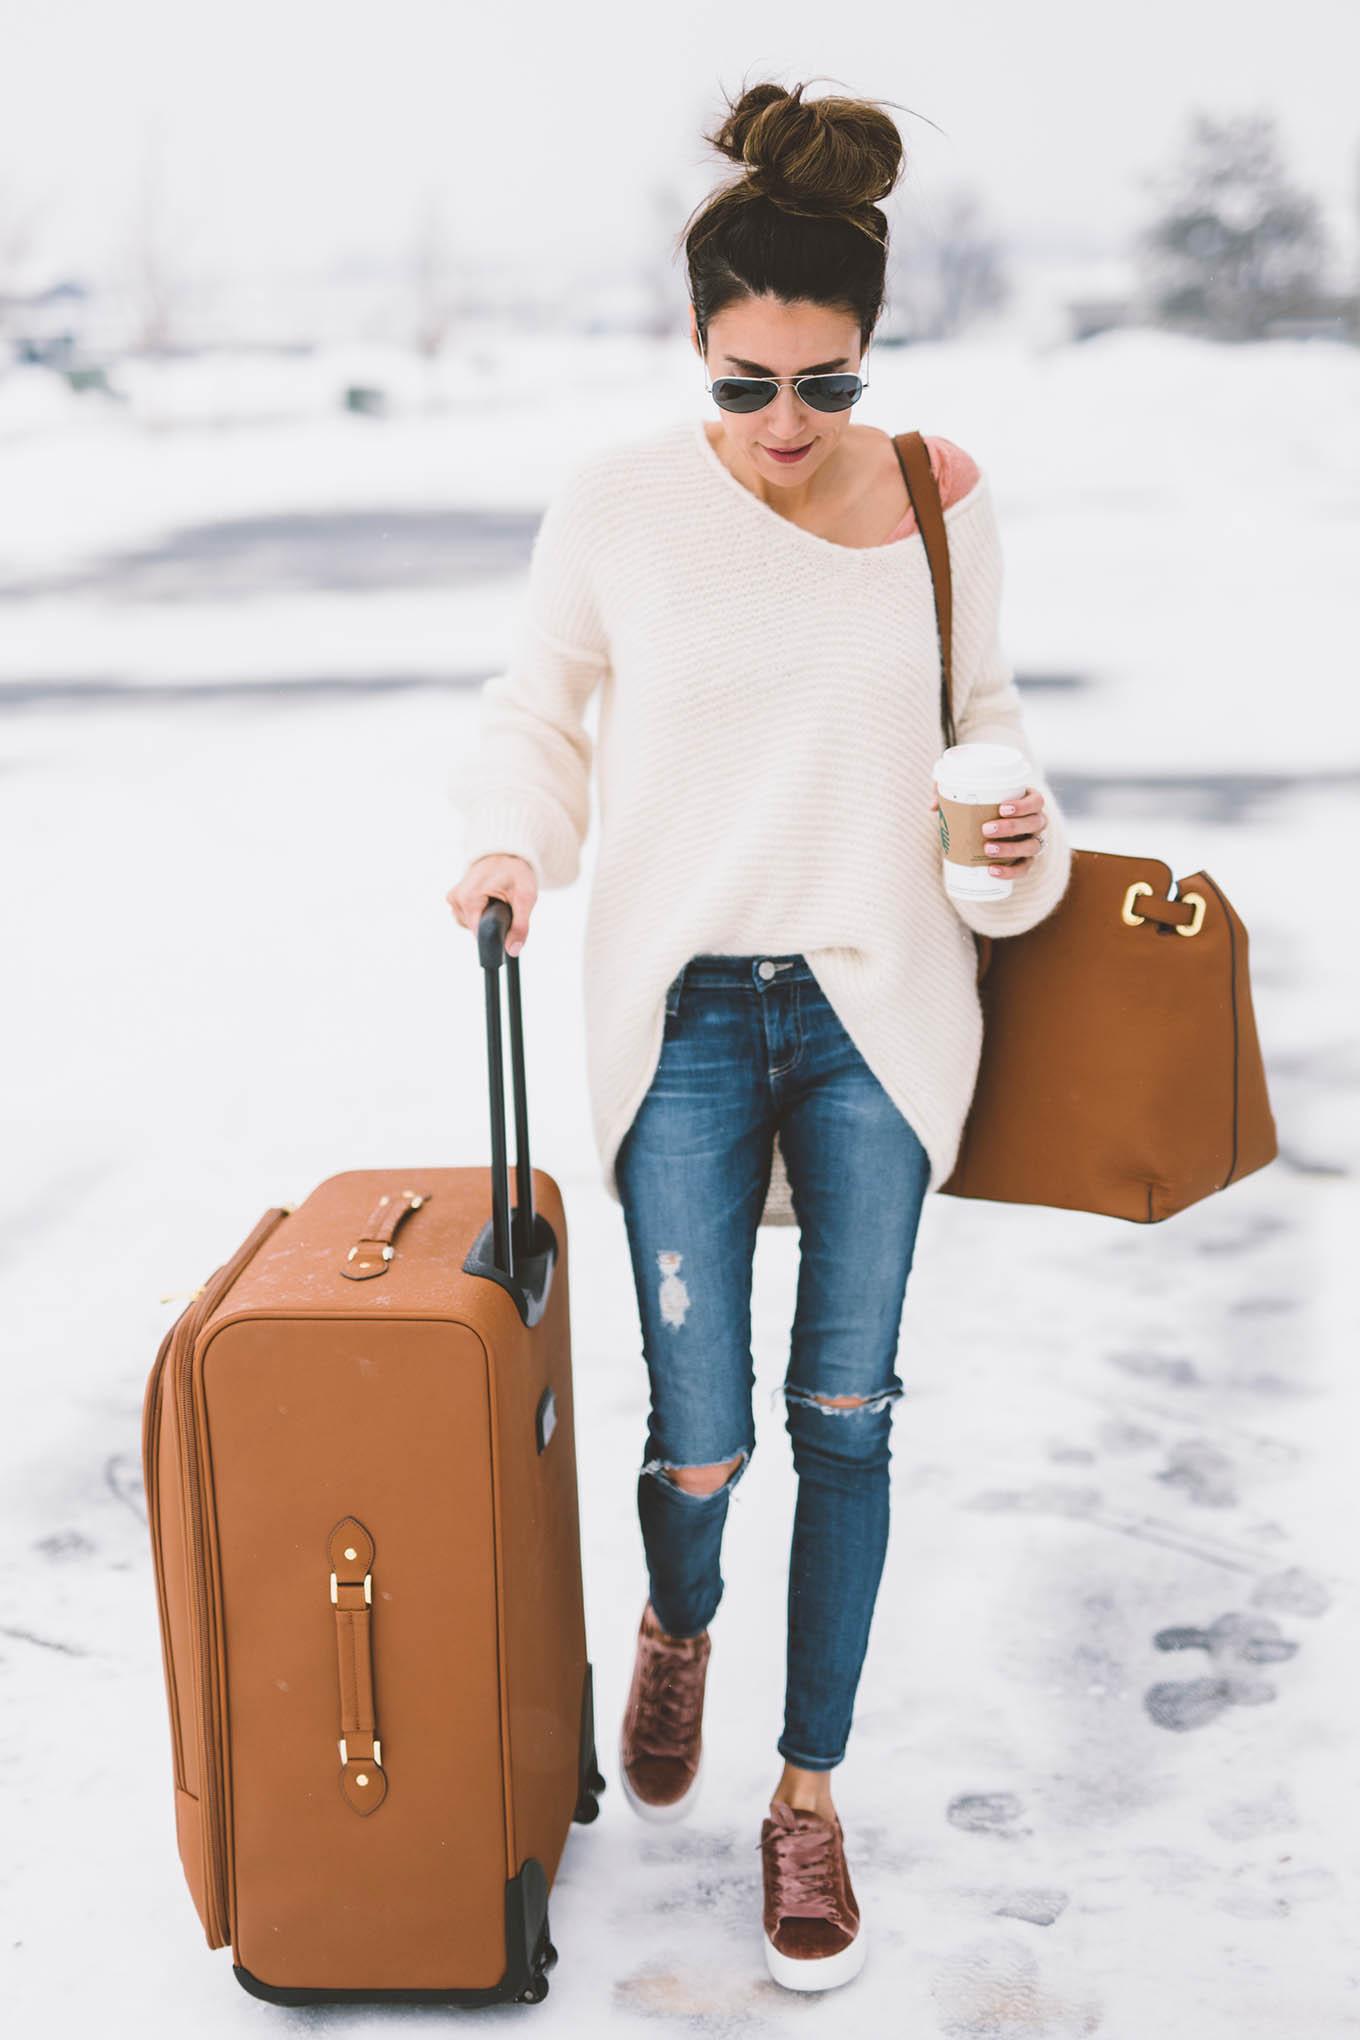 leather luggage hello fashion